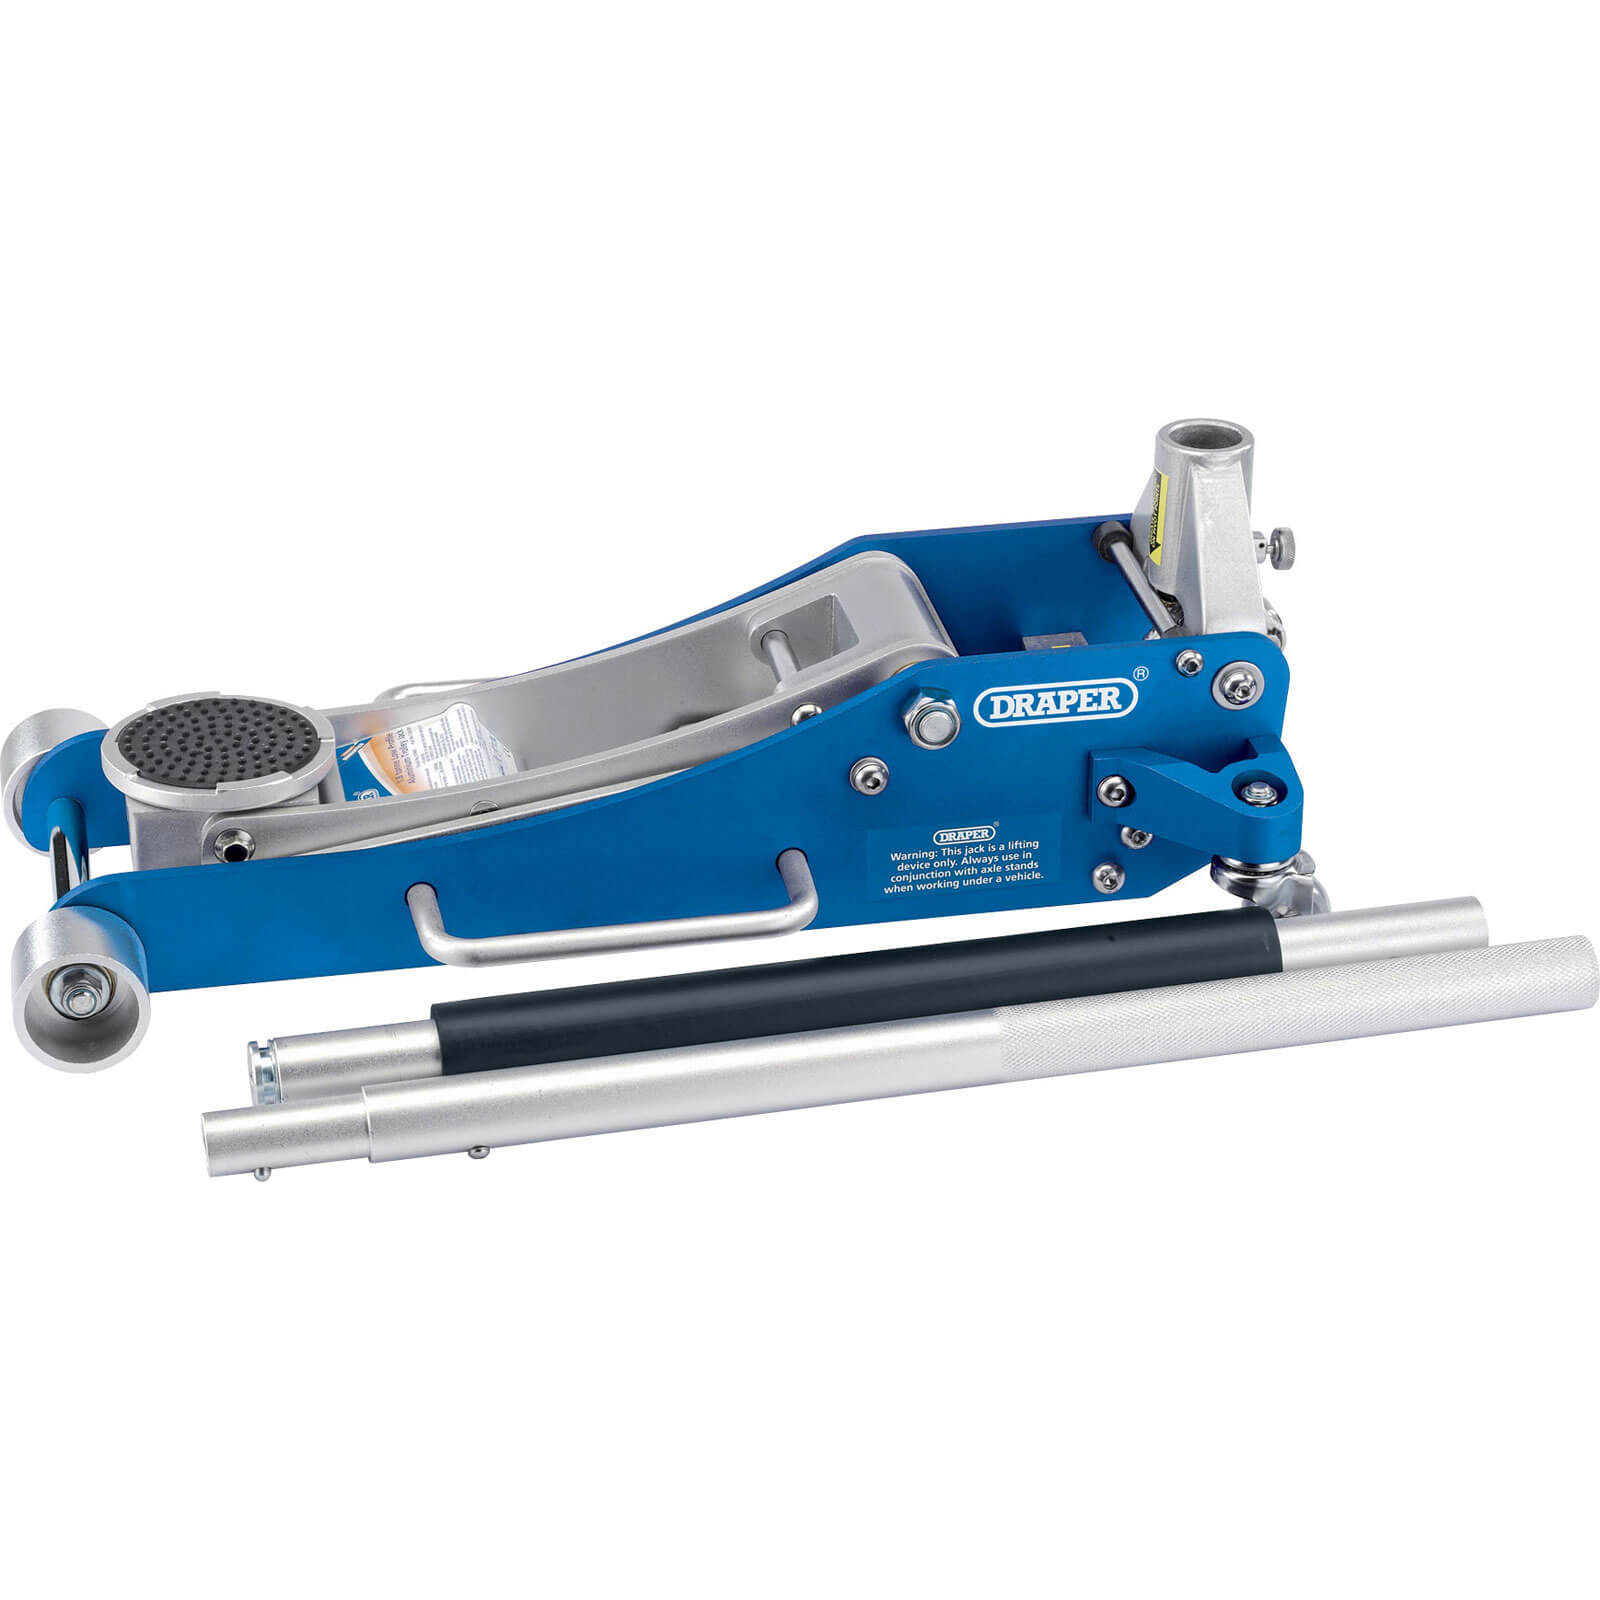 Draper TJA185 Quick Lift Aluminium Trolley Jack 1.8 Tonne